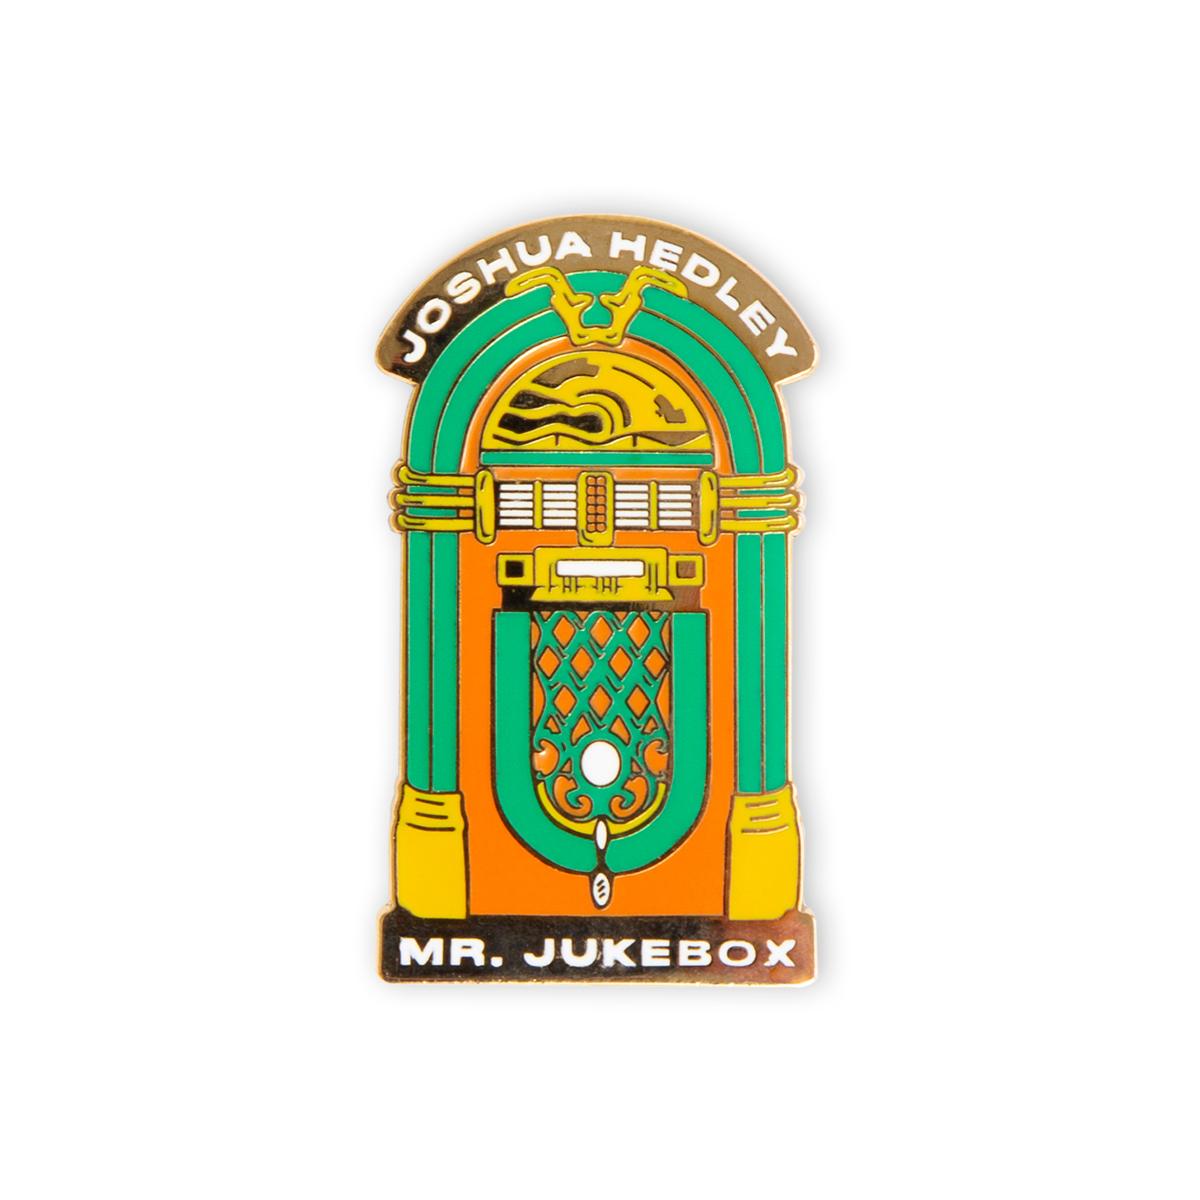 Joshua Hedley - Mr. Jukebox Lapel Pin